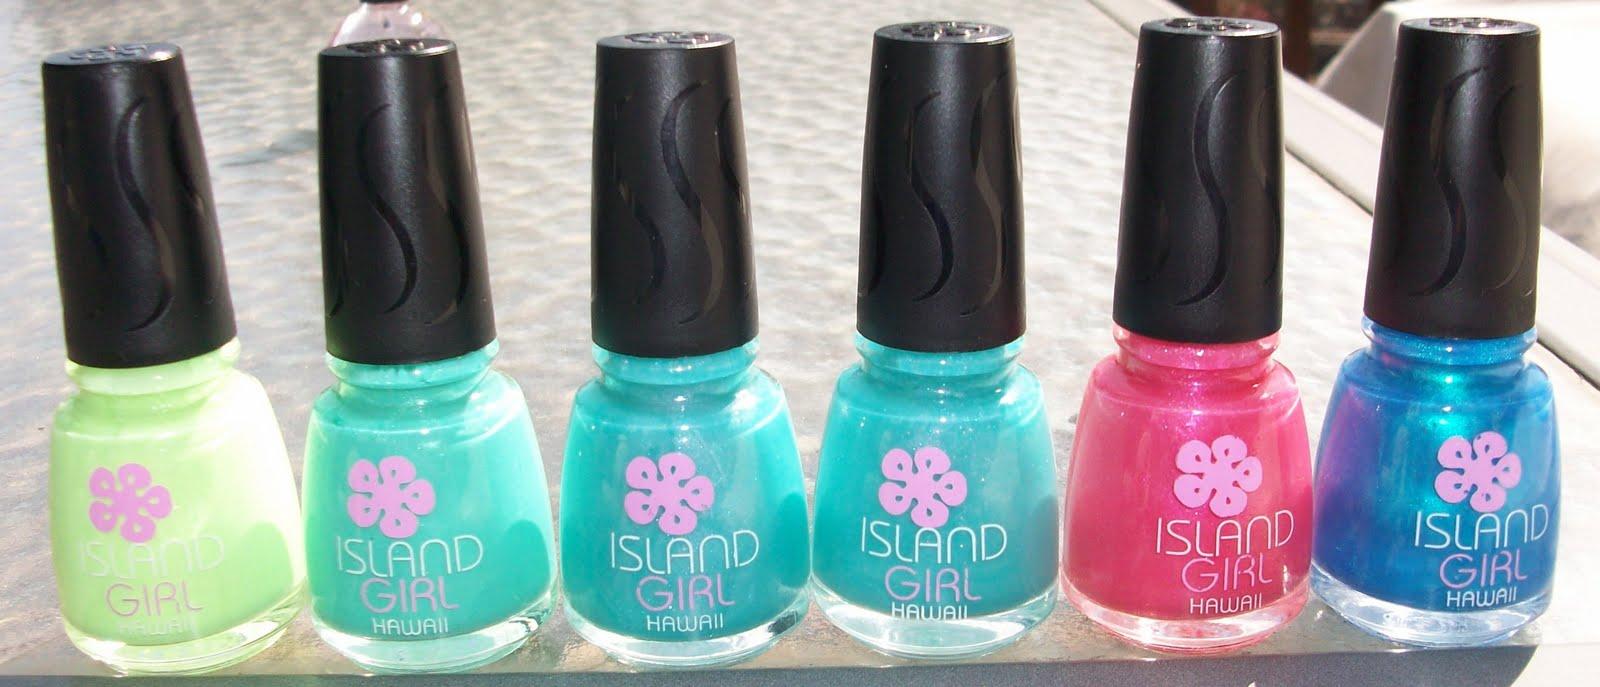 Ali\'s Nail News: UPDATE! Added Polish Names! Lots of Island Girl ...